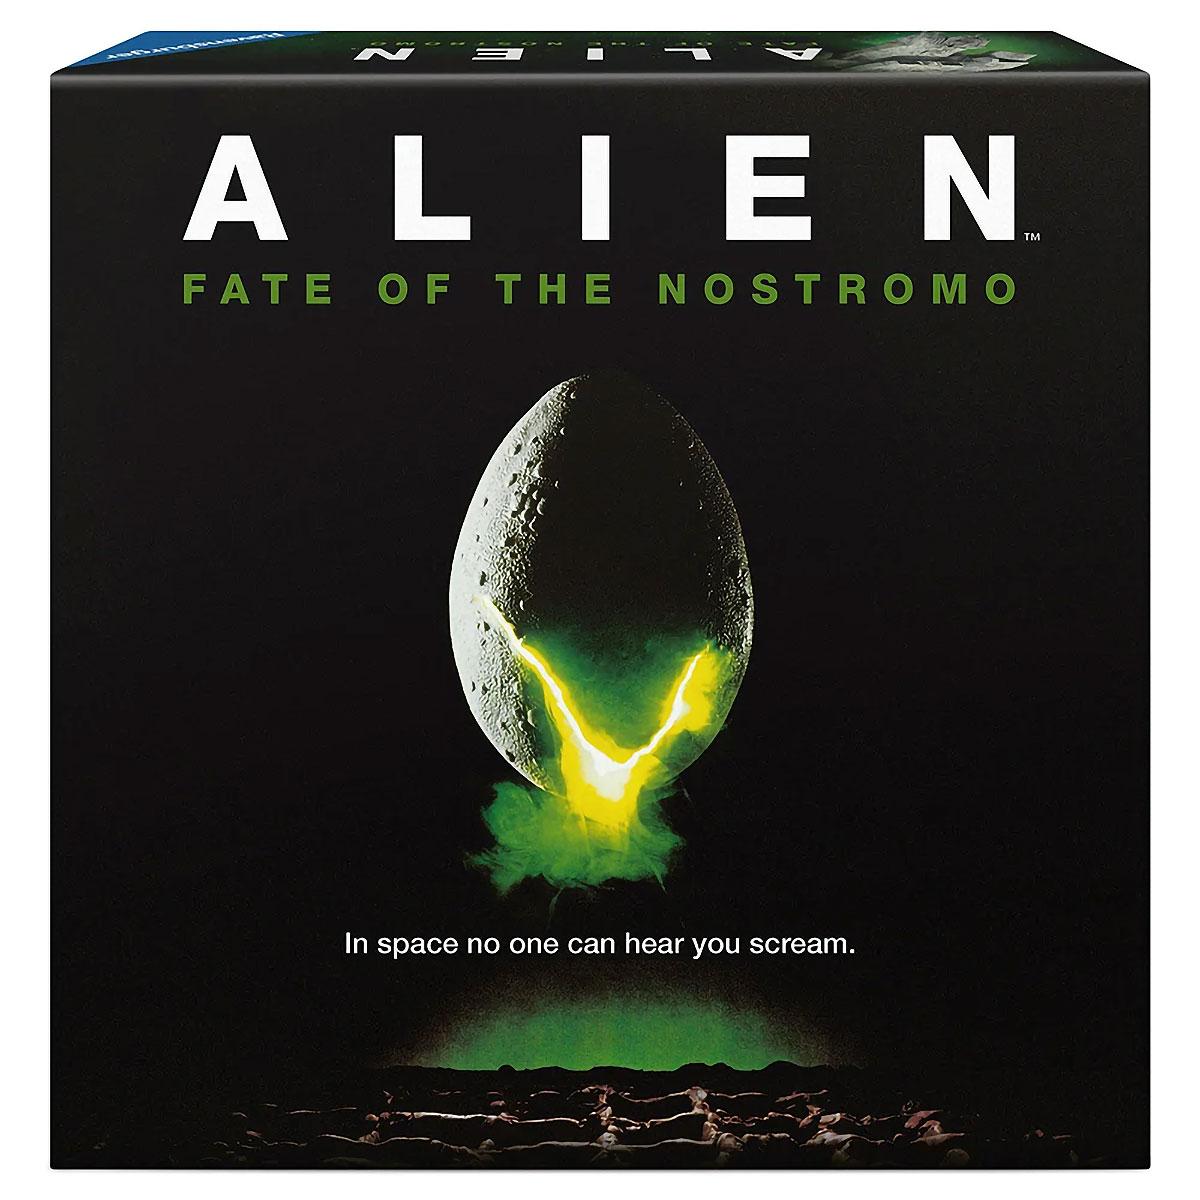 Alien Fate of the Nostromo Board Game